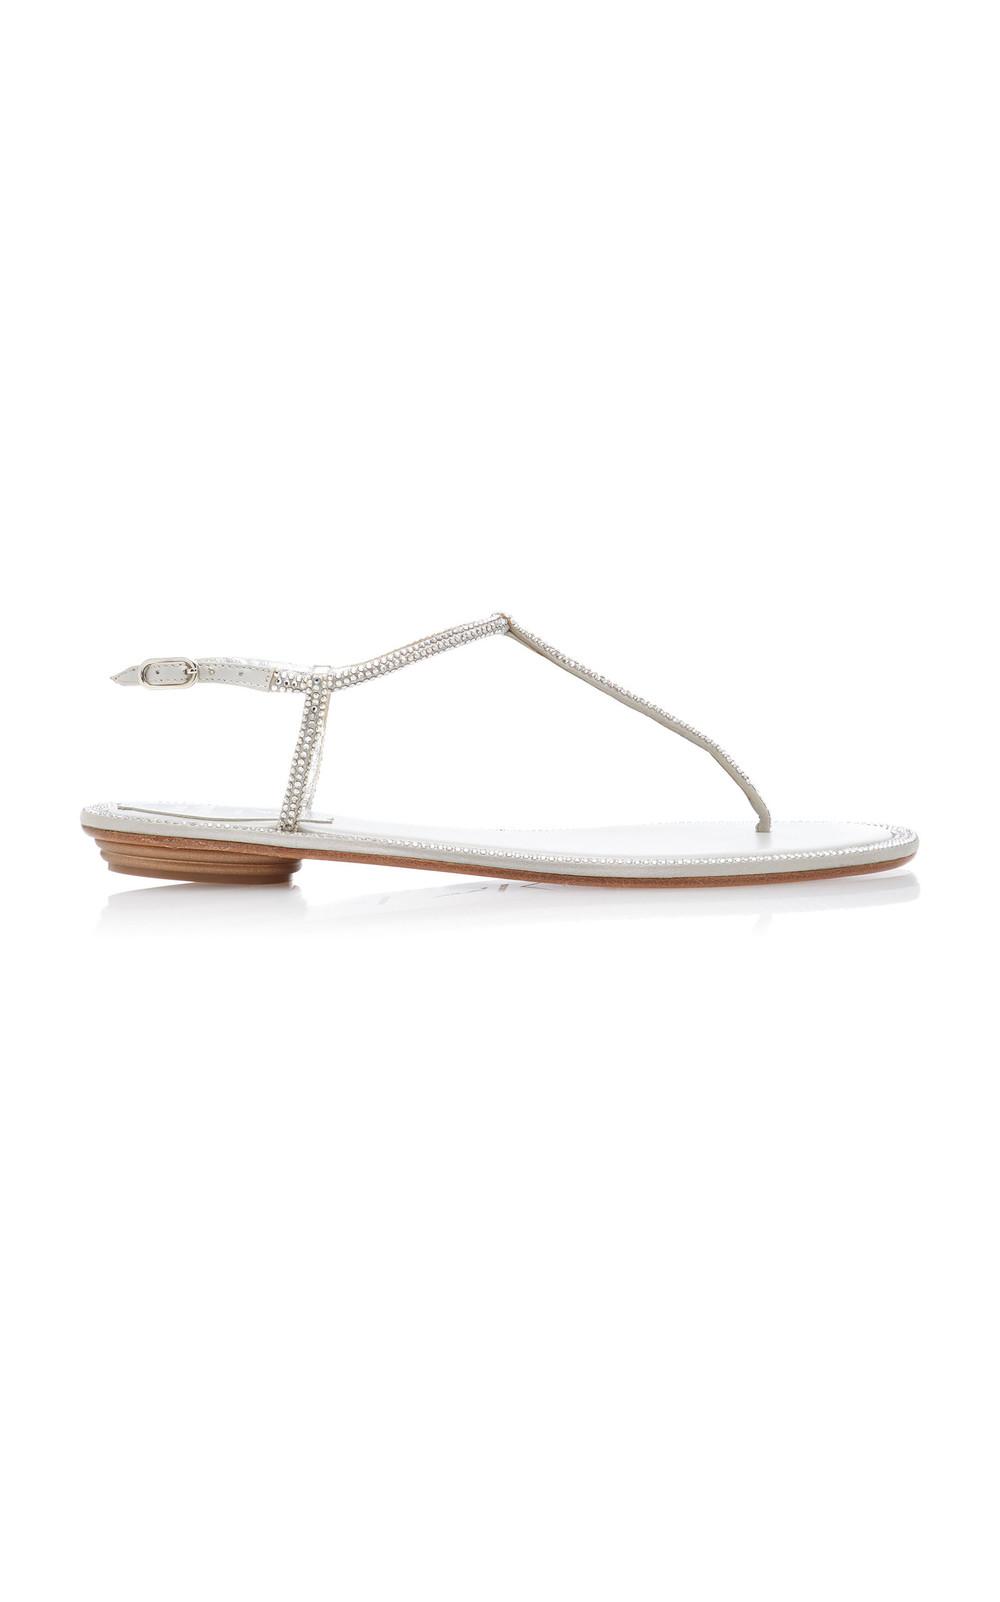 Rene Caovilla Crystal-Embellished Satin Sandals in silver